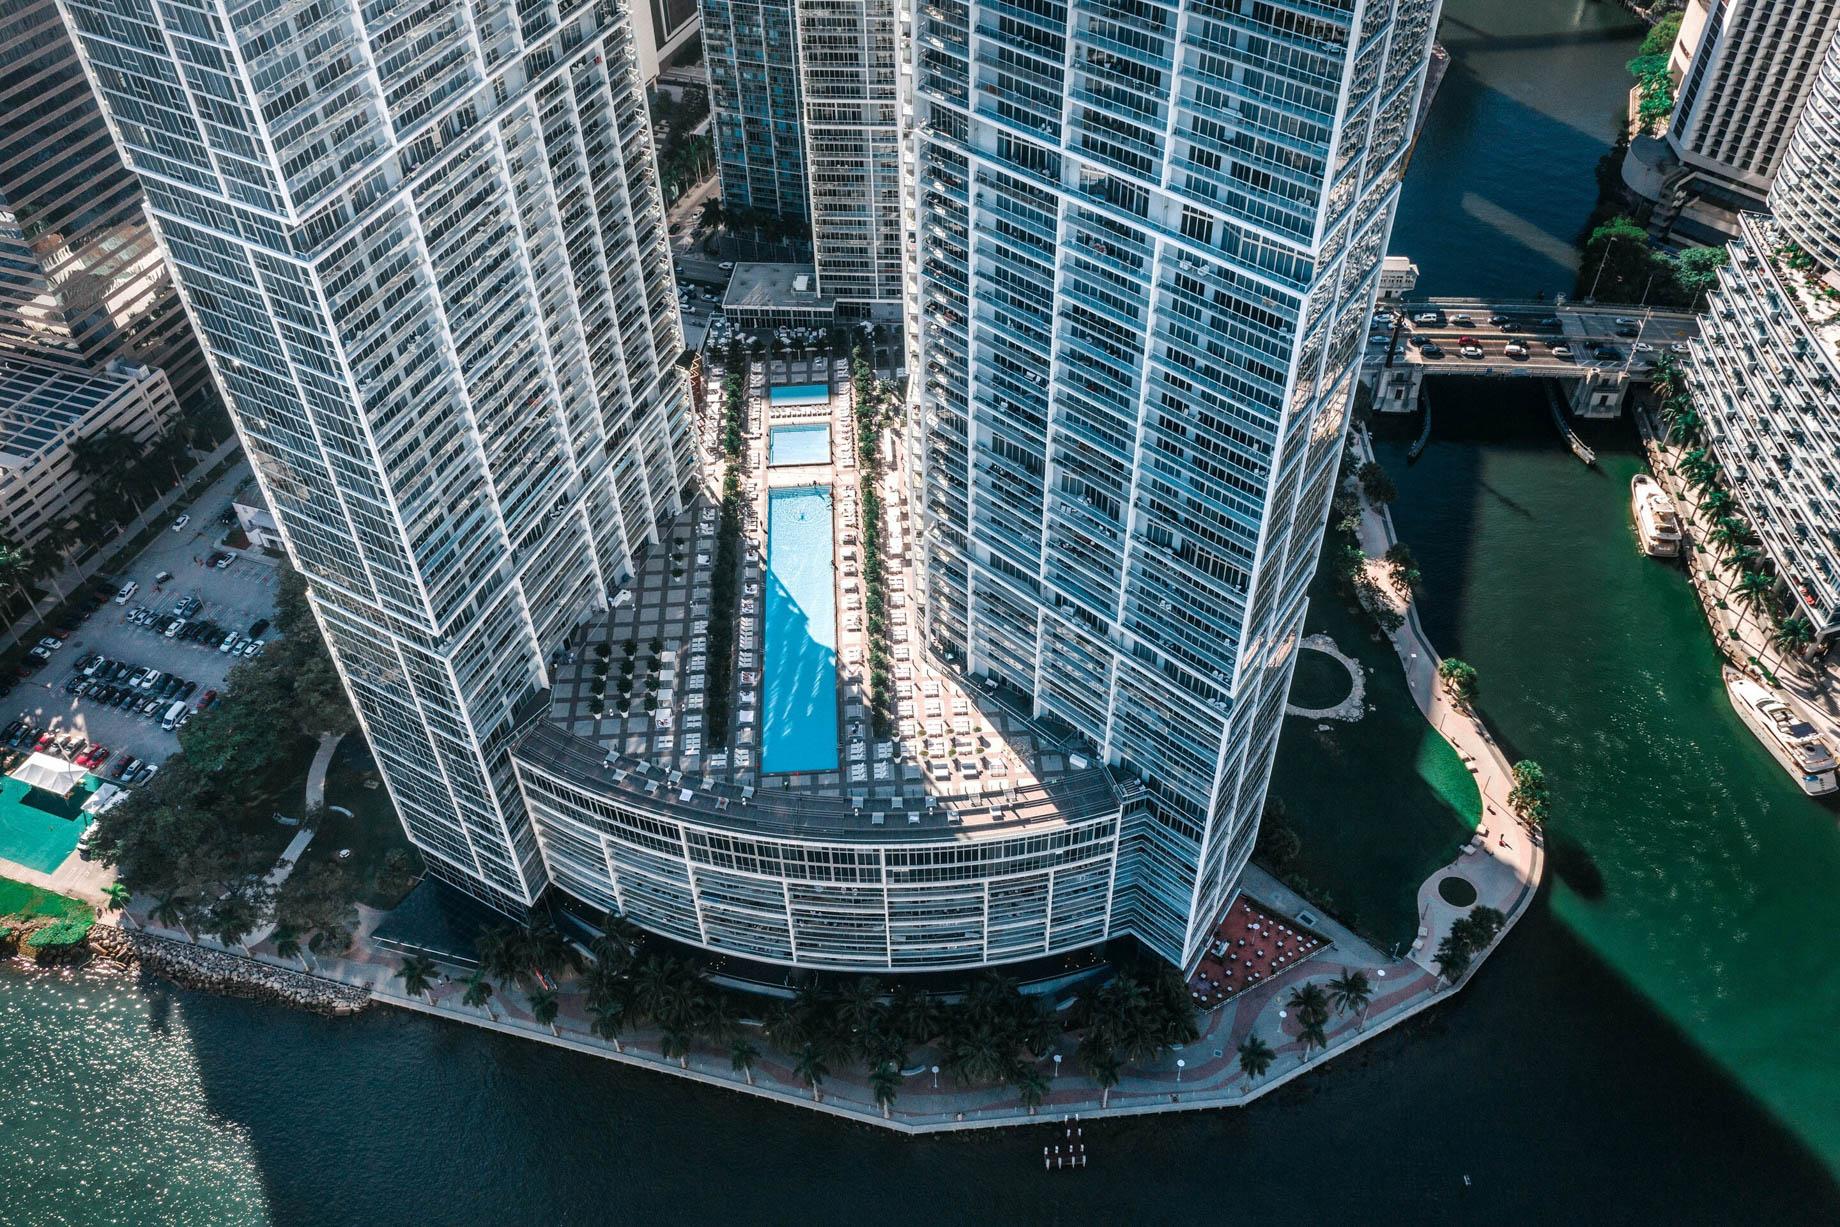 W Miami Luxury Hotel - Miami, FL, USA - Hotel Aerial View